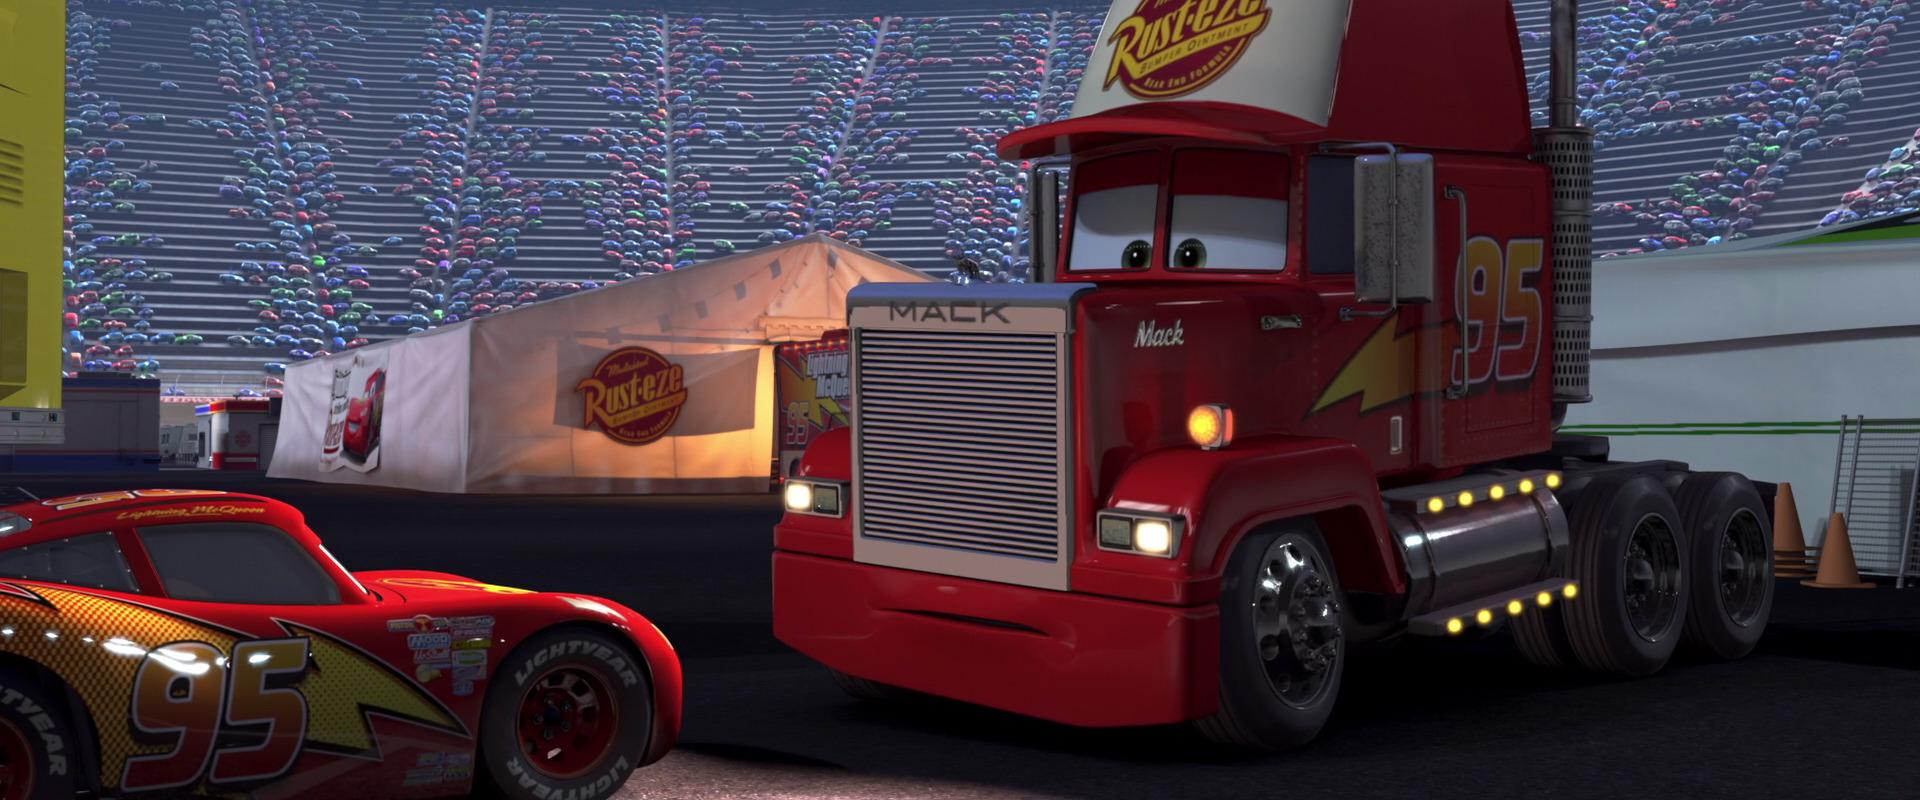 Mack personnage dans cars pixar planet fr - Cars camion mack ...